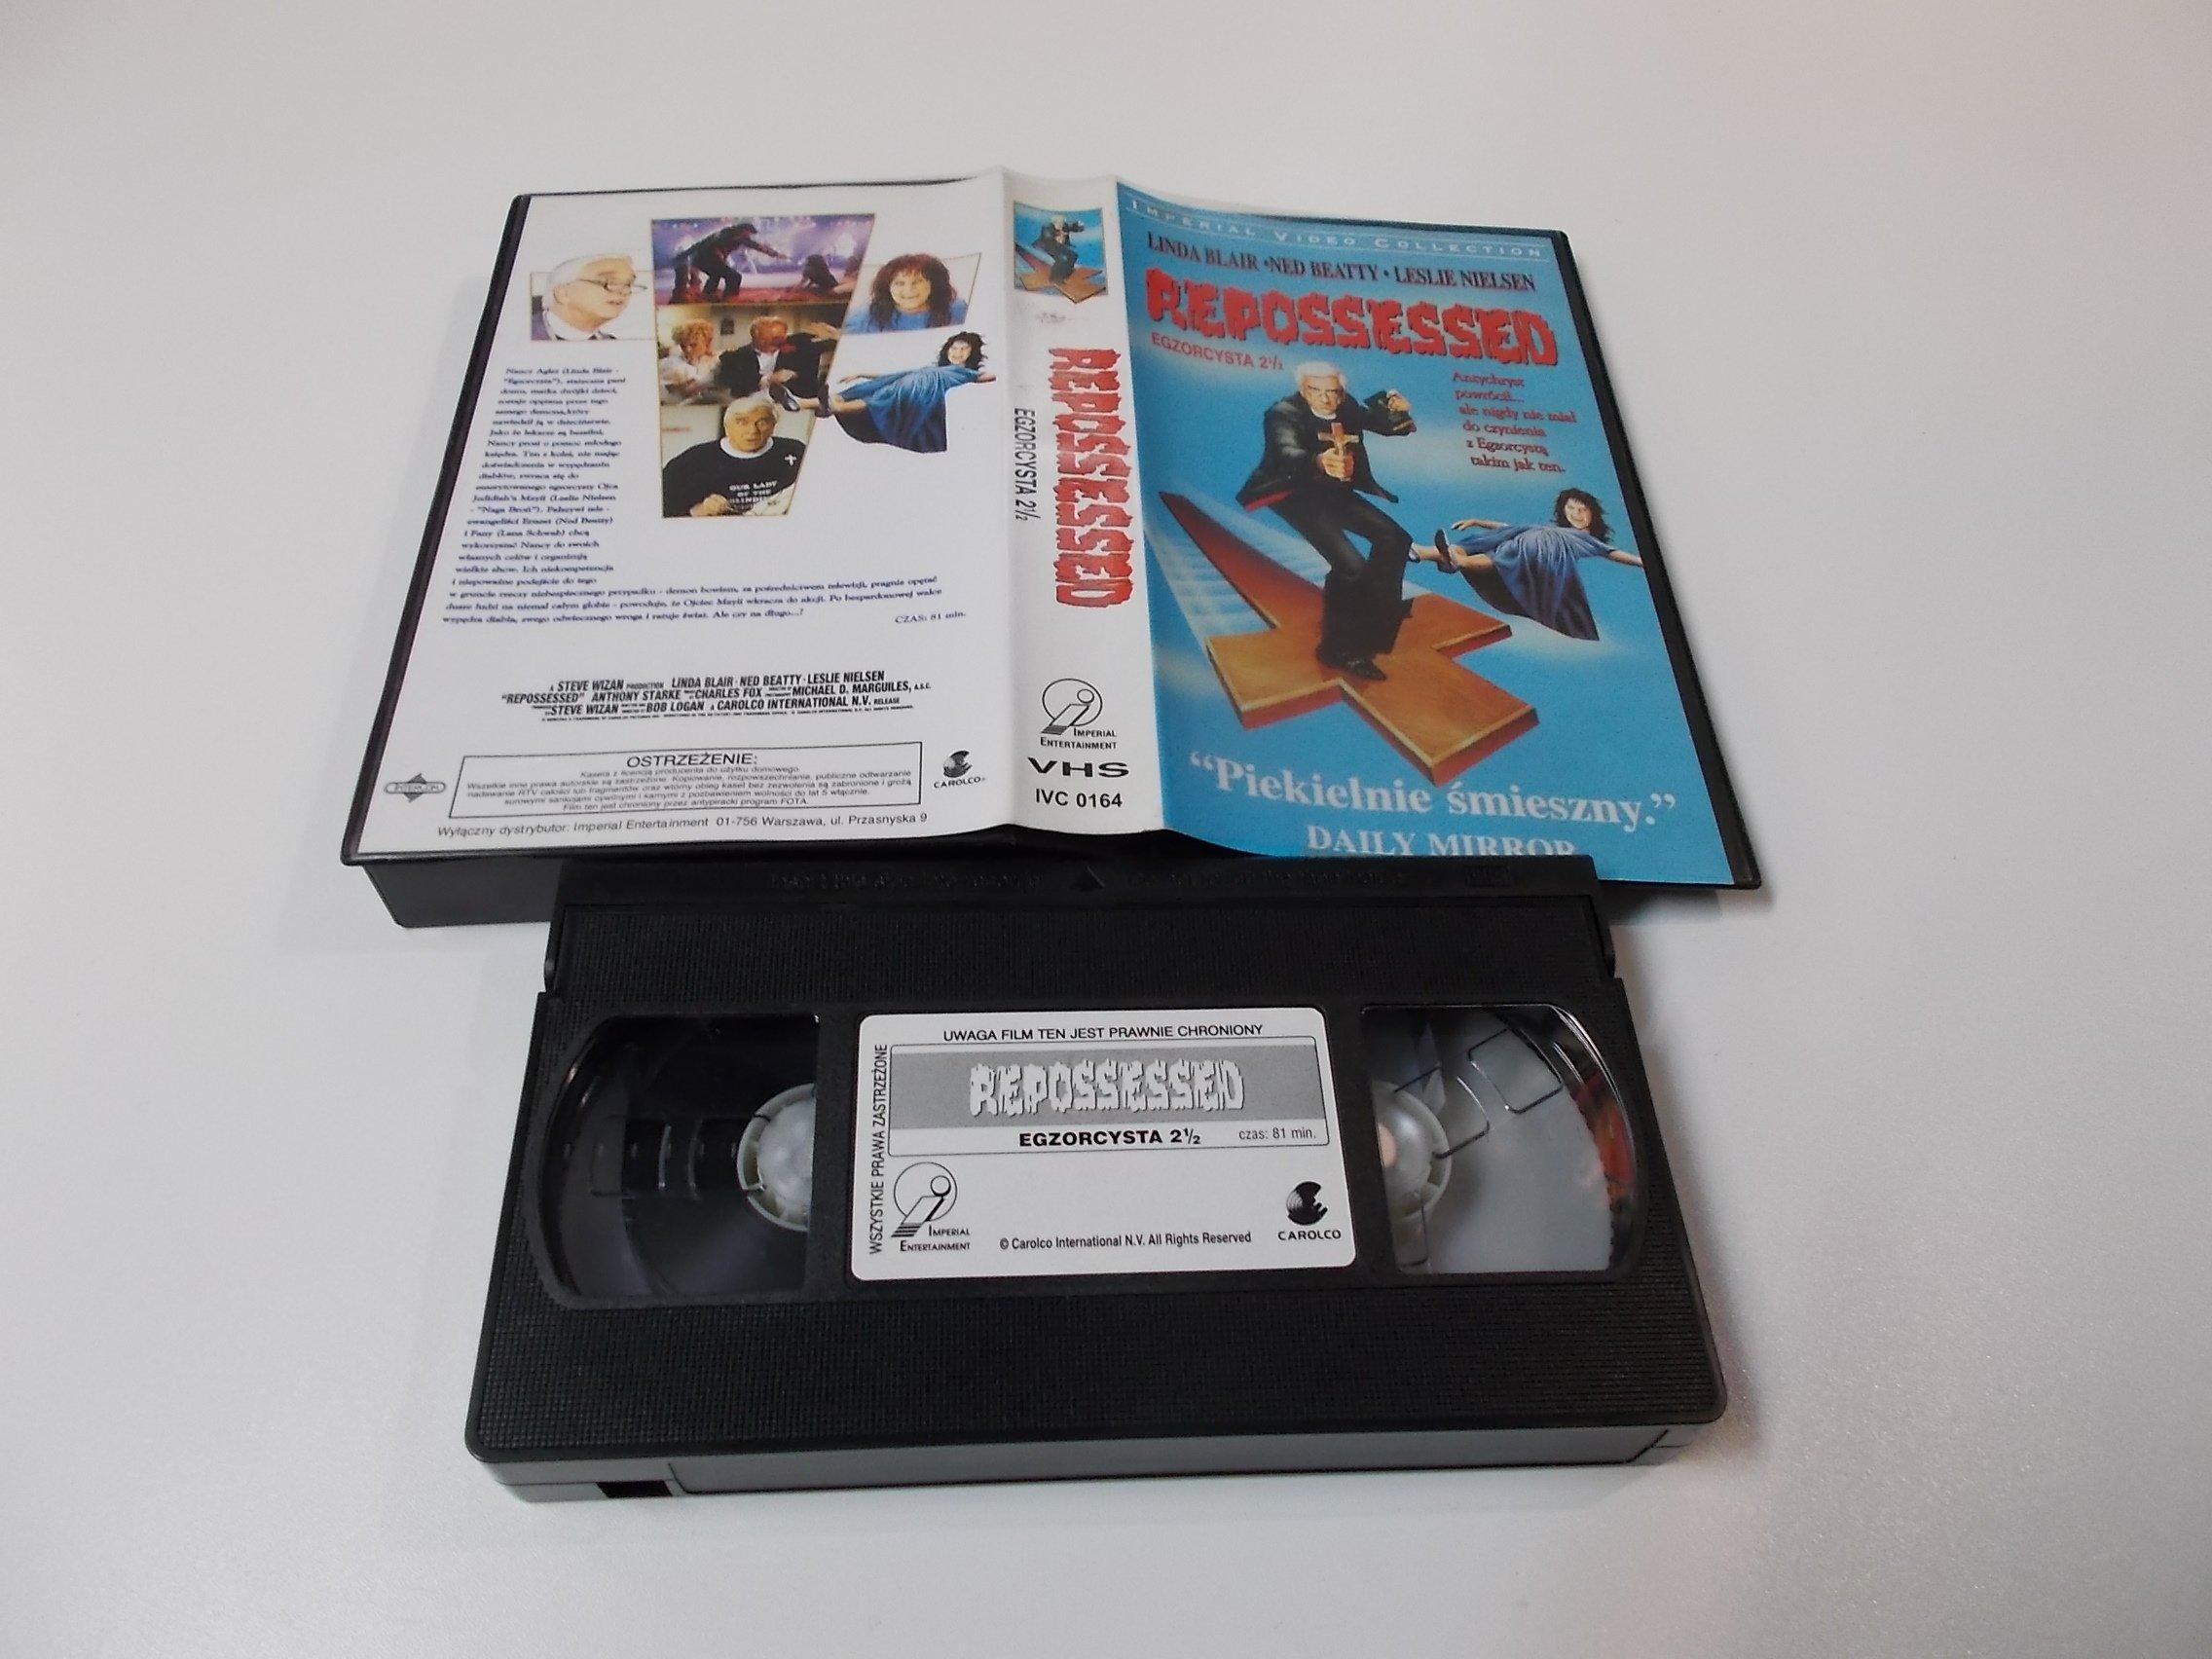 EGZORCYSTA 2 1/2 - Linda Blair, Leslie Nielsen - VHS Kaseta Video - Opole 1637